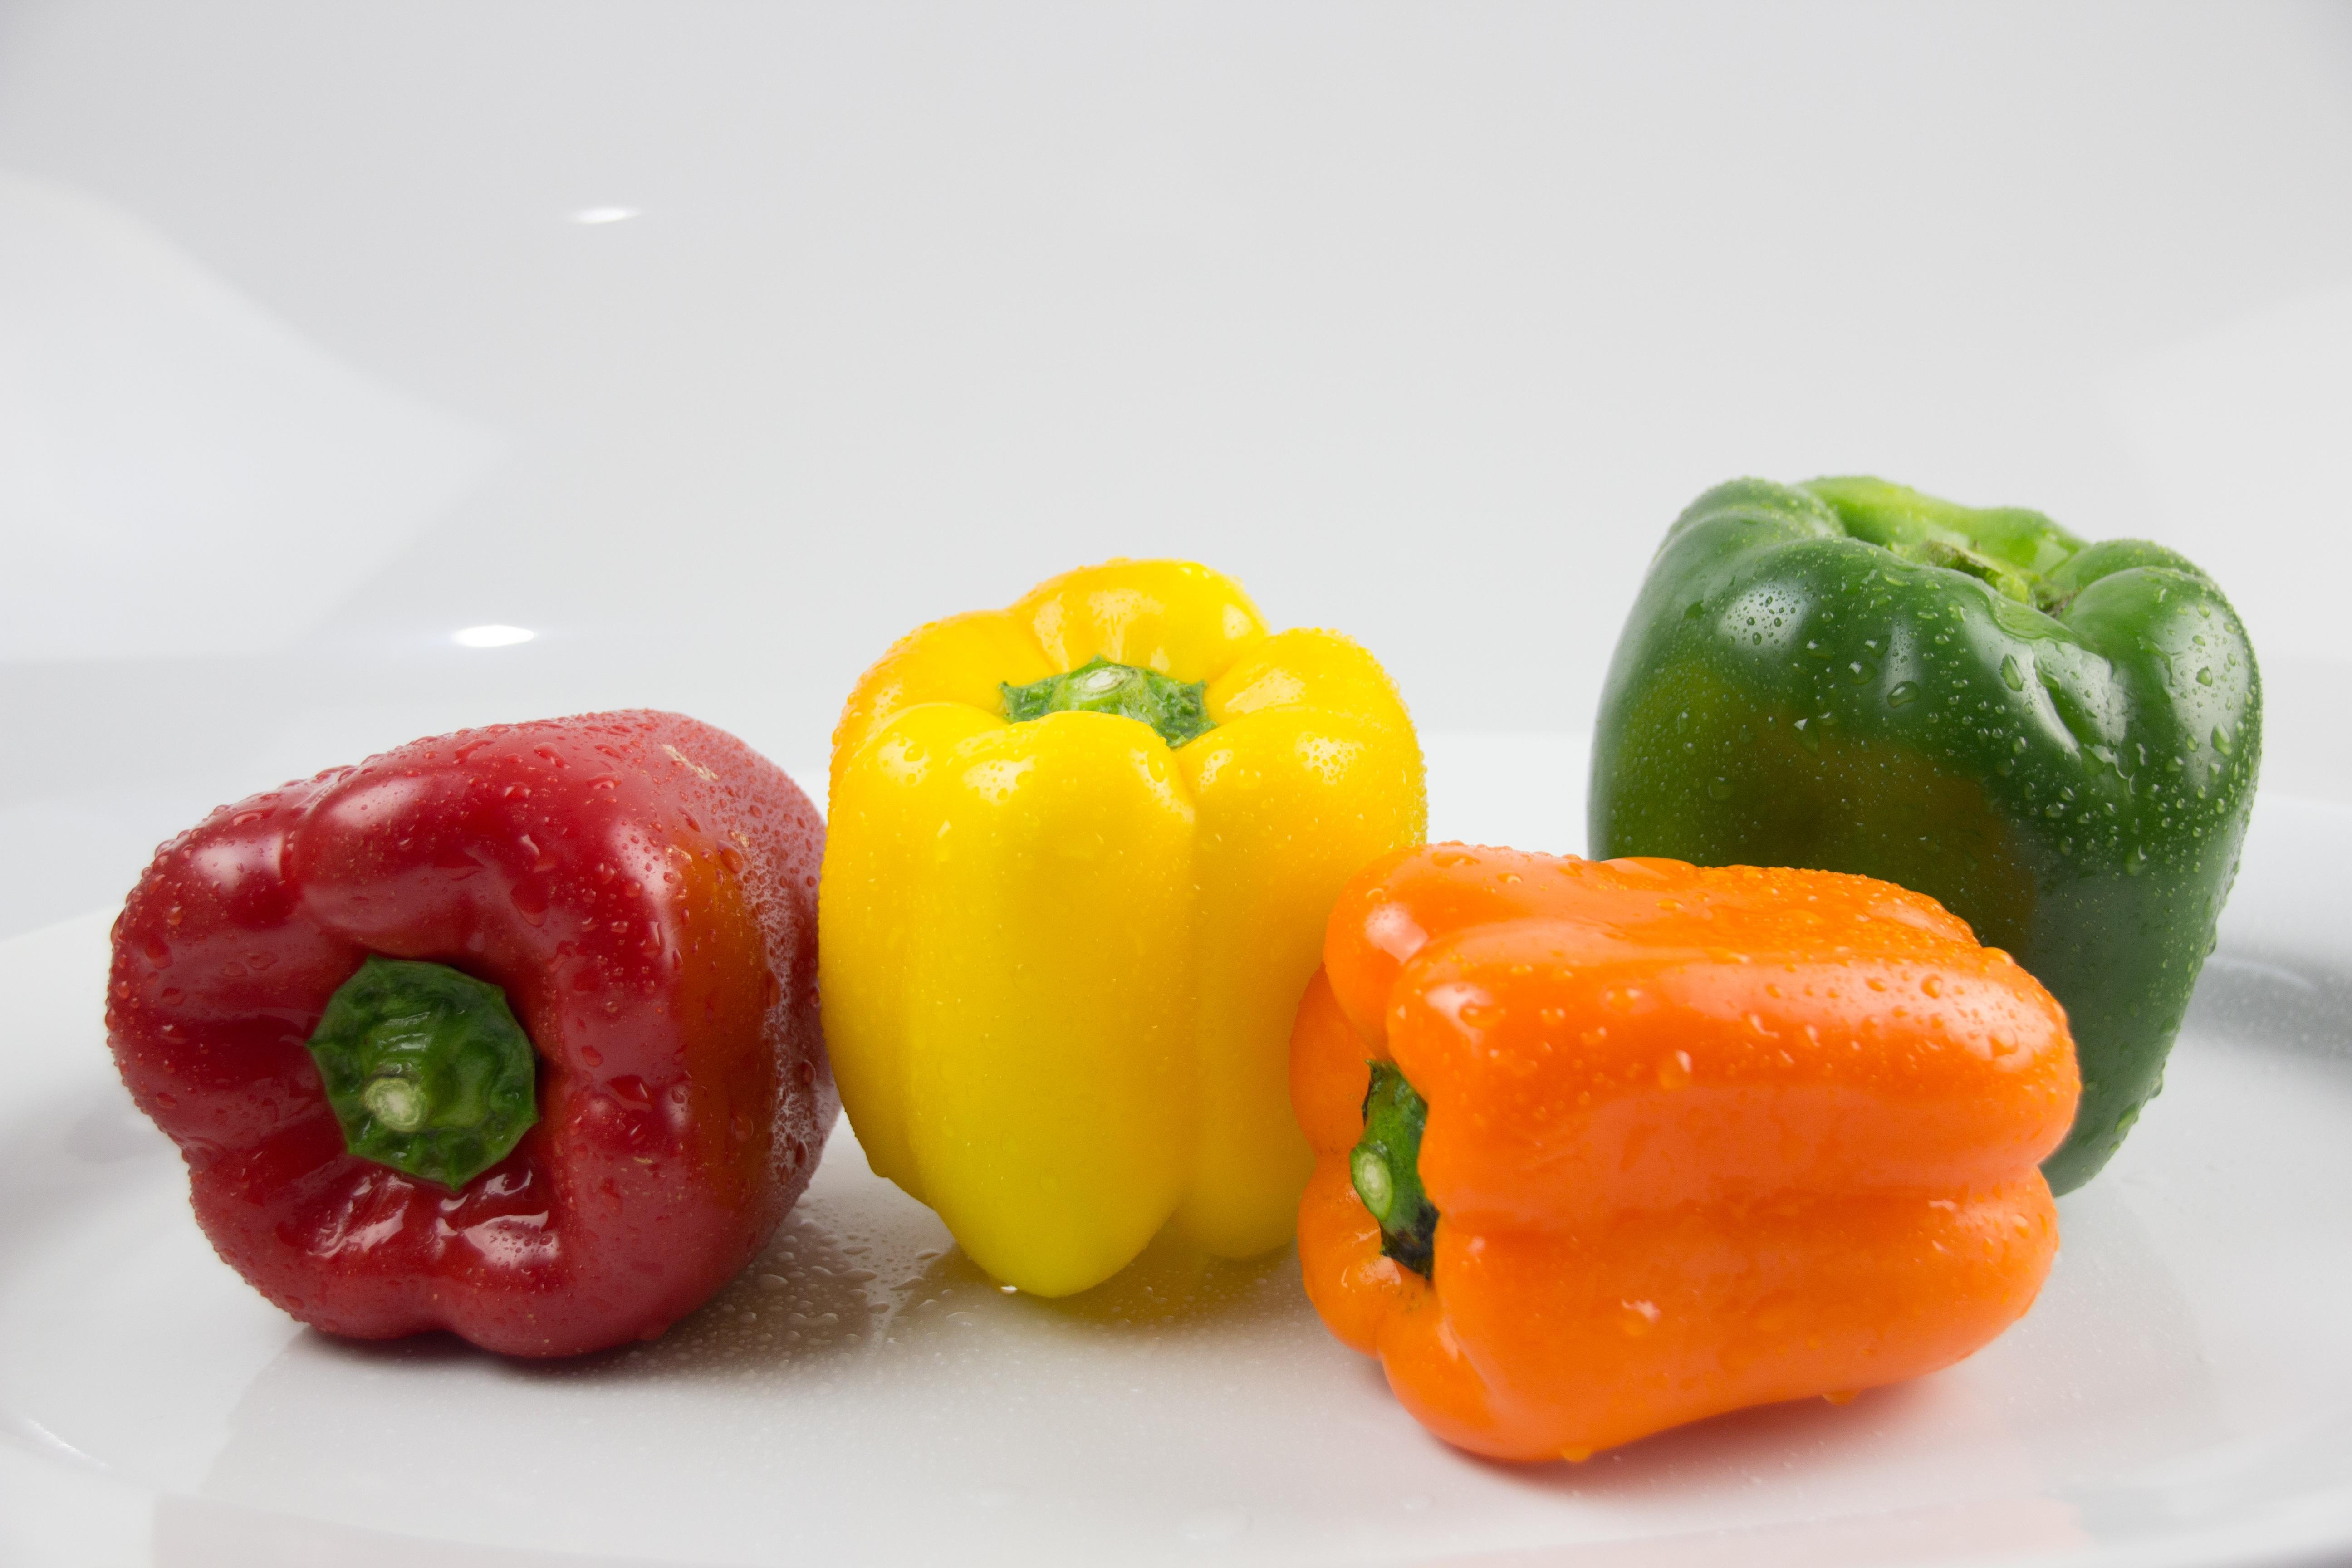 Fotos gratis : Fruta, restaurante, comida, Produce, vegetal, cocina ...